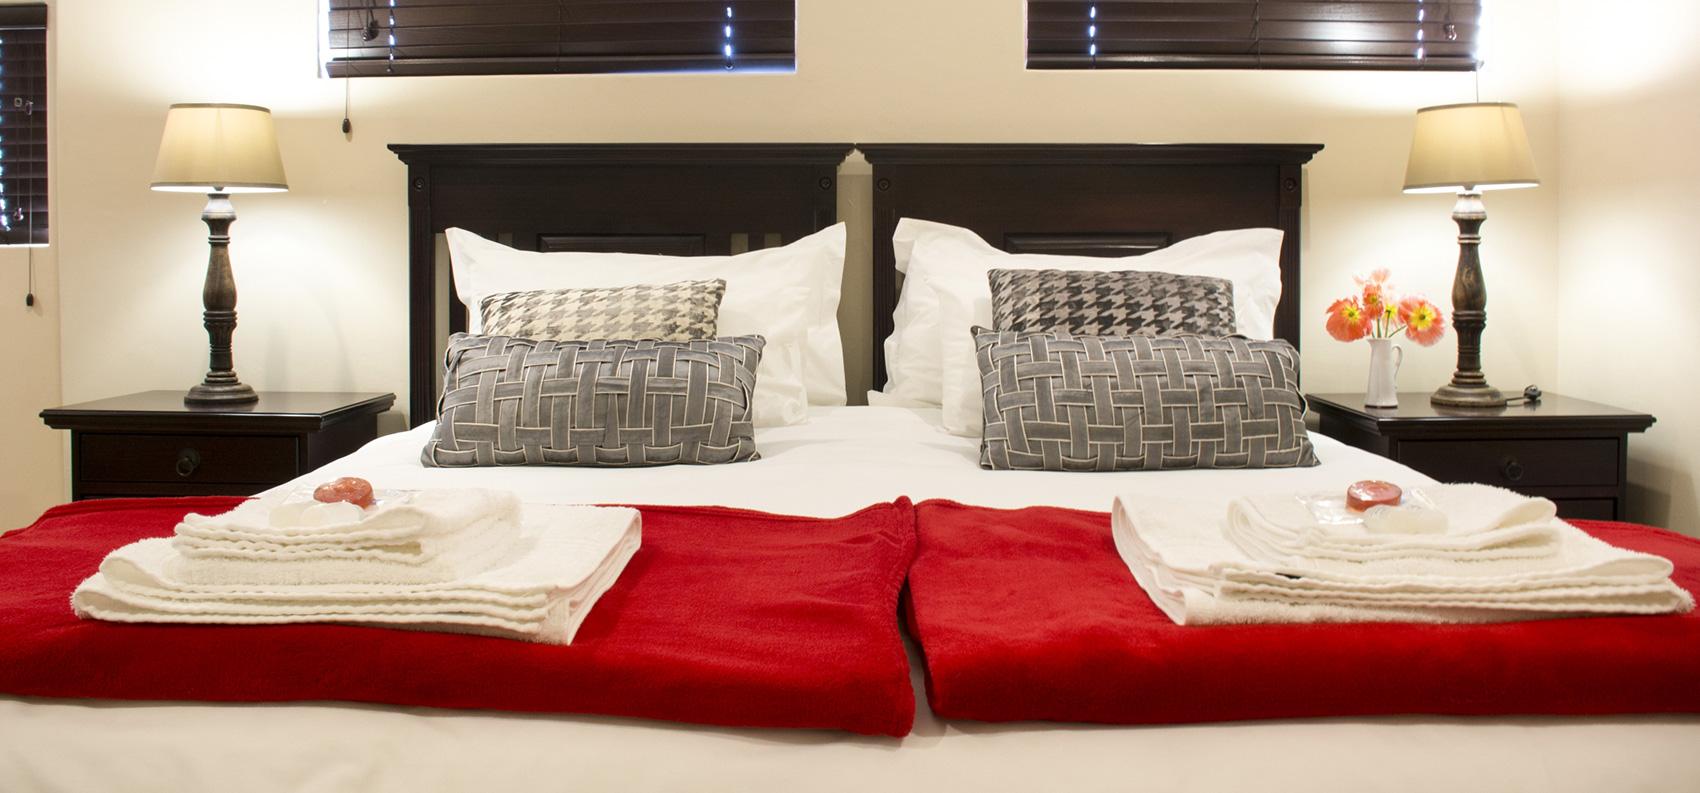 Cornerhouse on conan for Affordable bedroom furniture pretoria